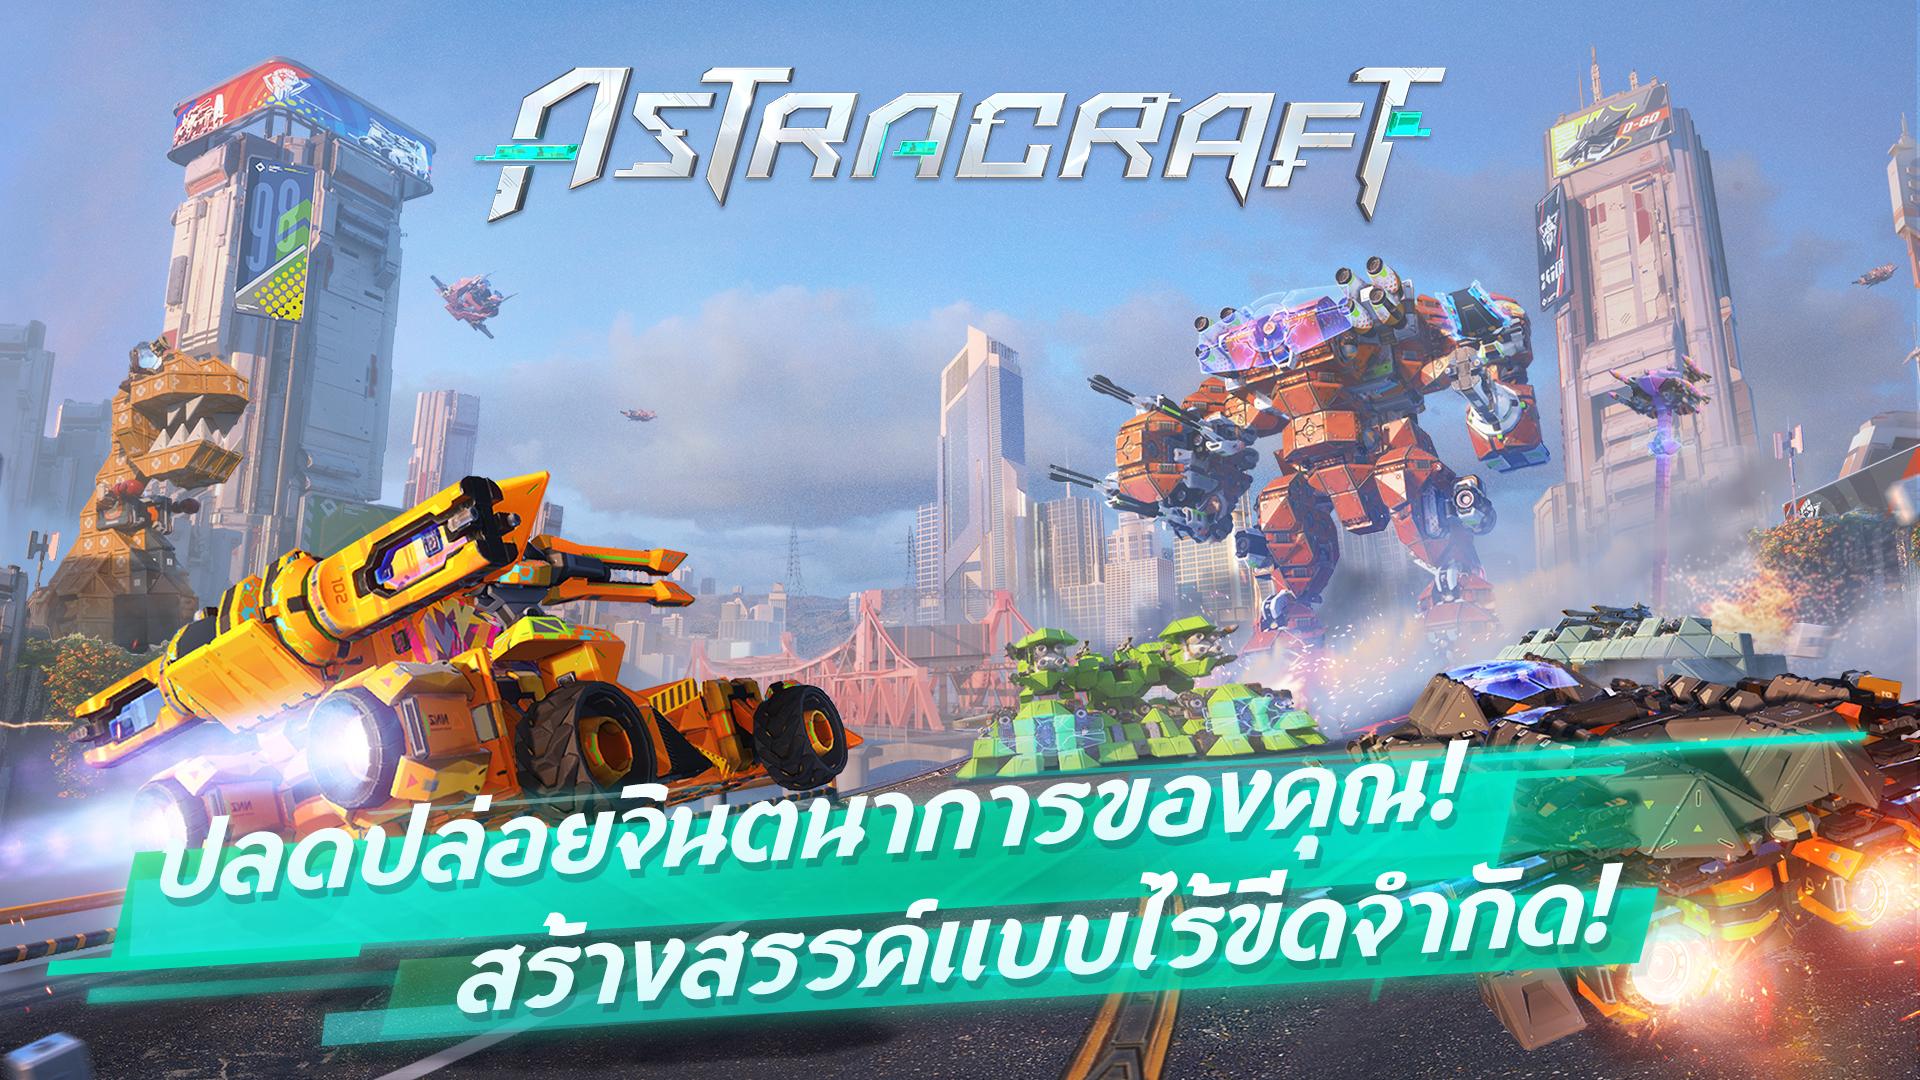 Astracraft 1412021 1